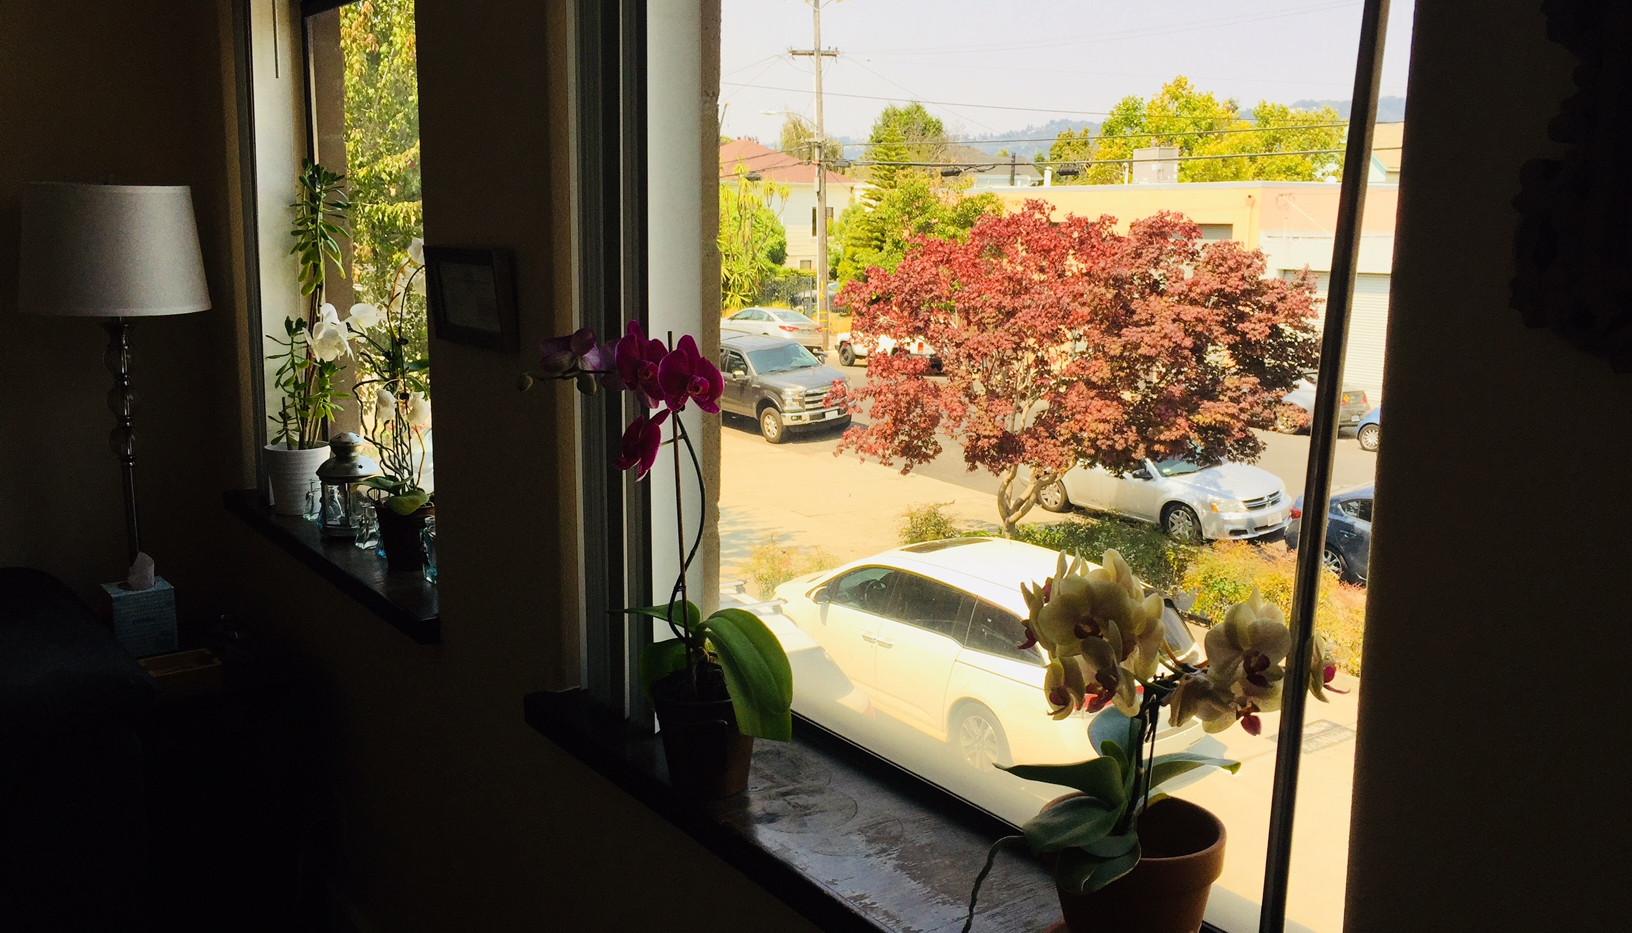 Large office windows